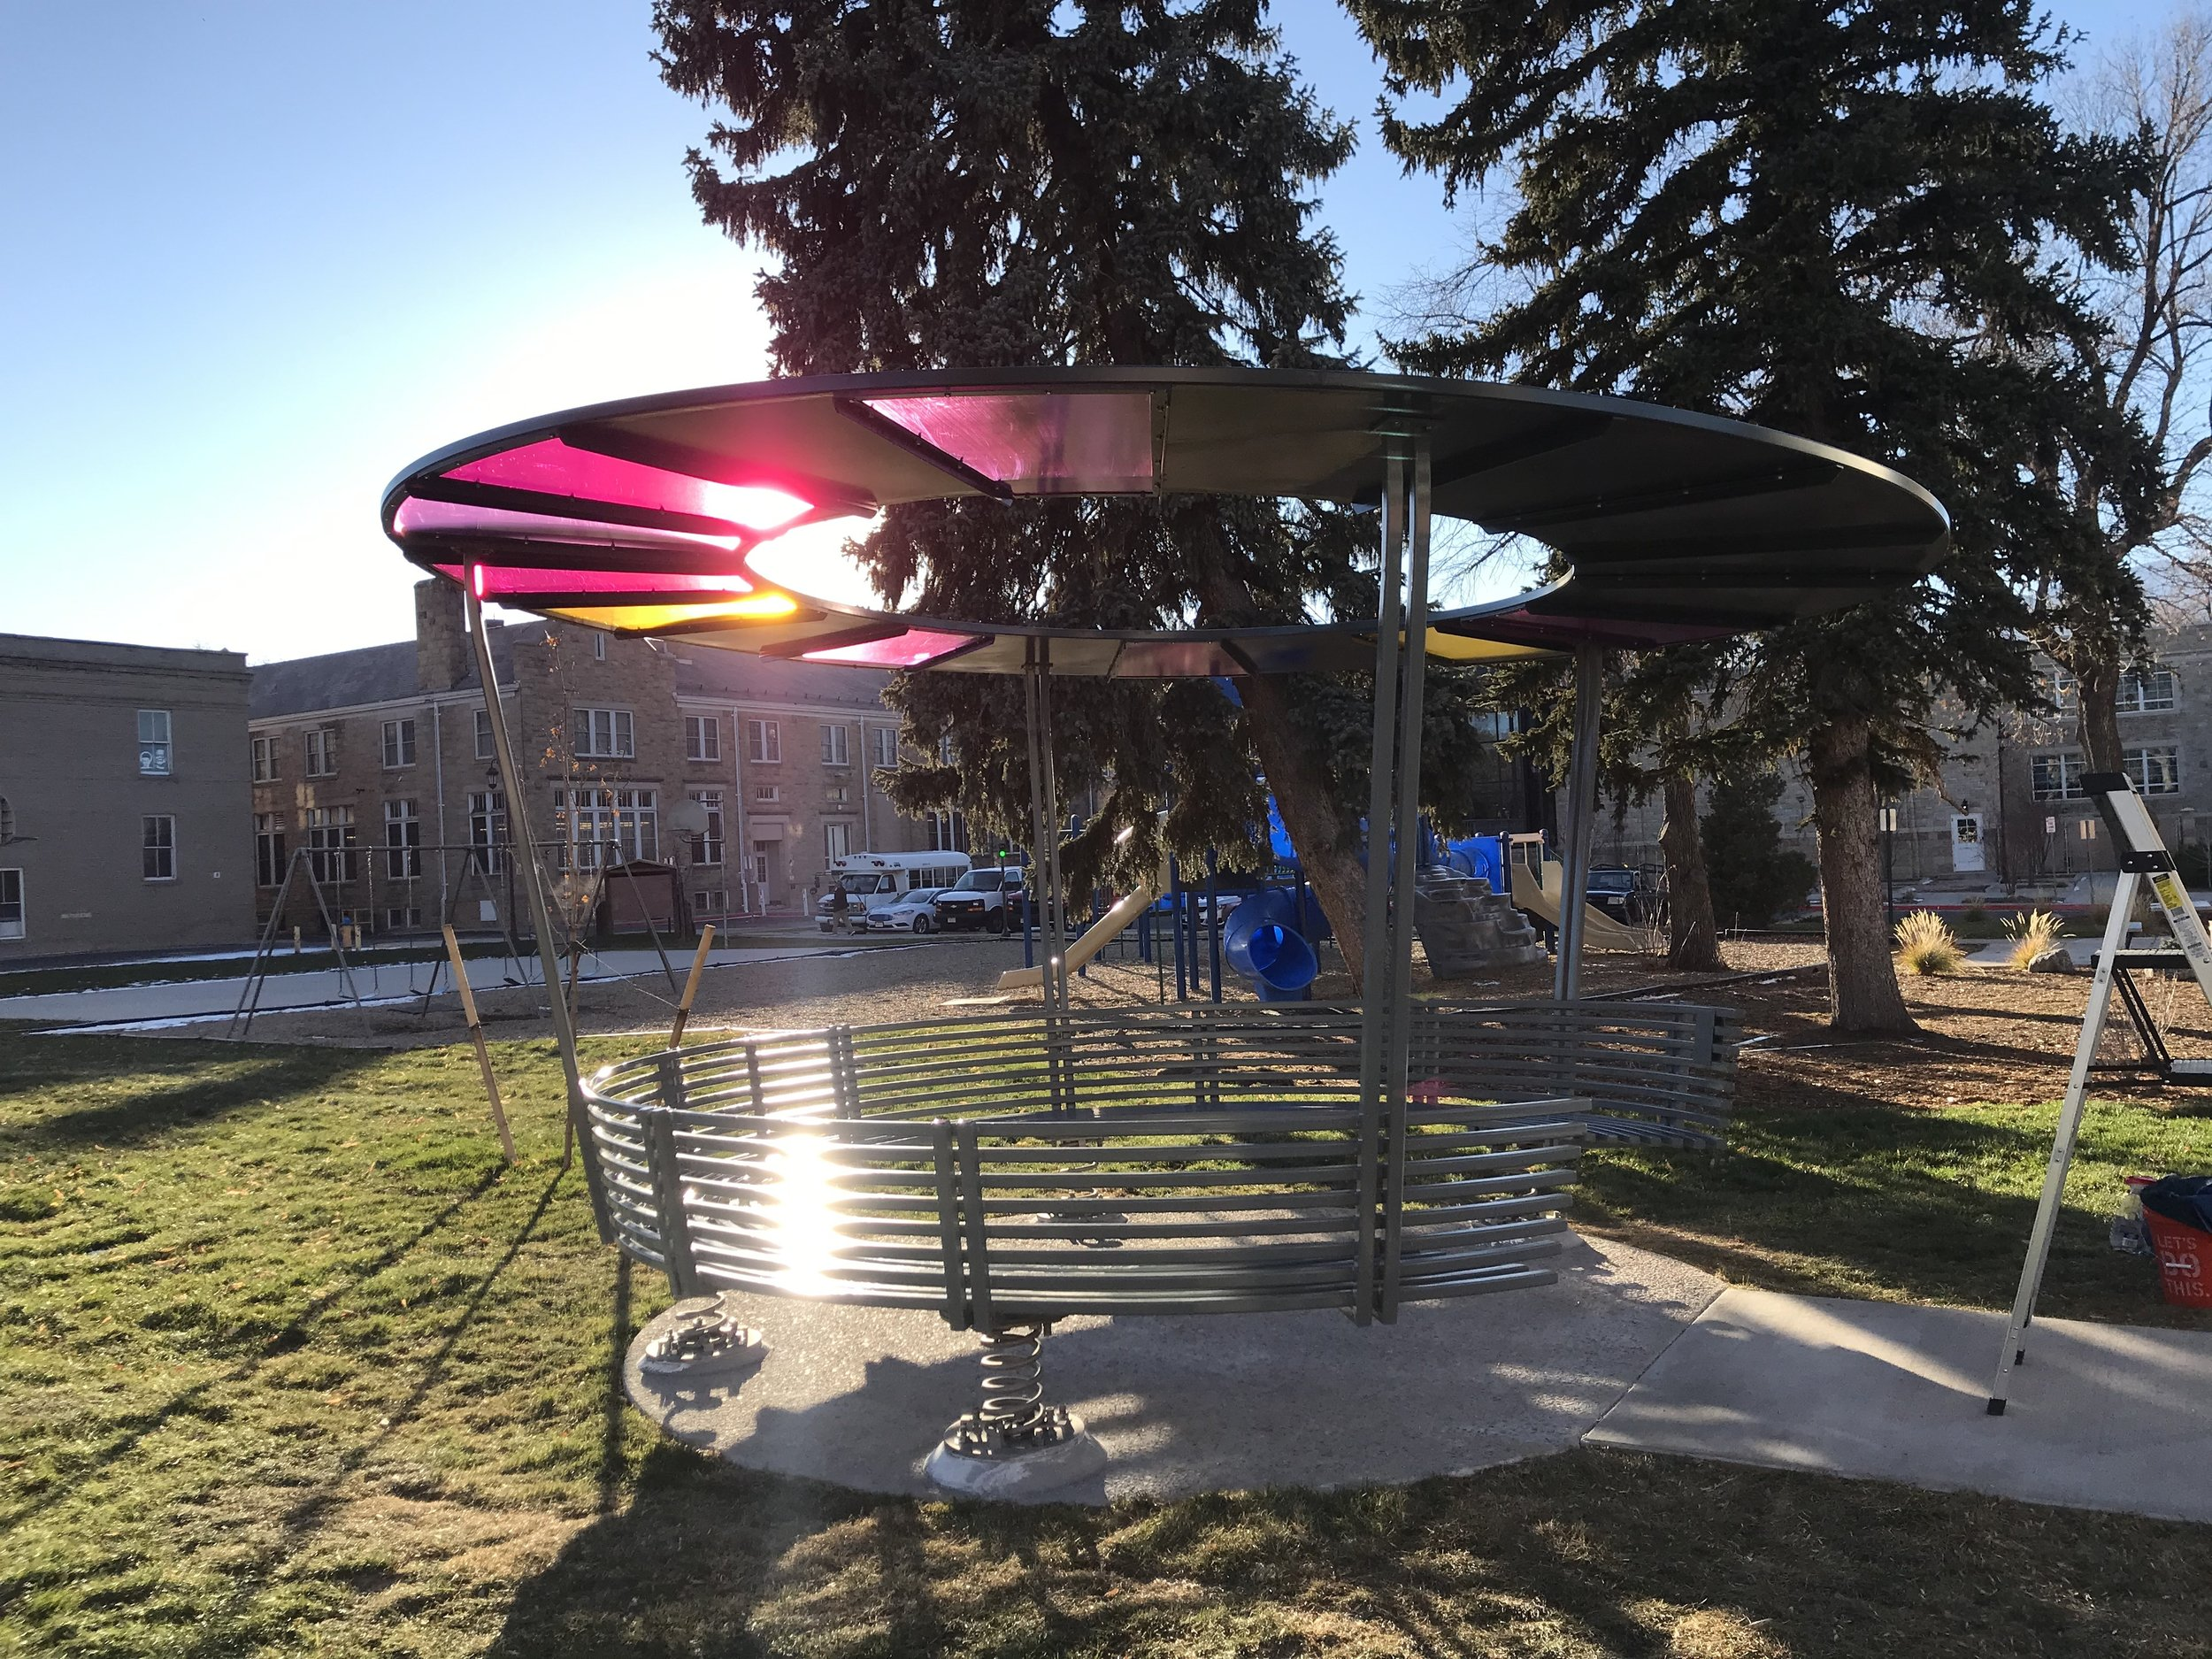 Matthew Geller_Springs_Colorado Springs_Public Art Services_J Grant Projects_11.JPG